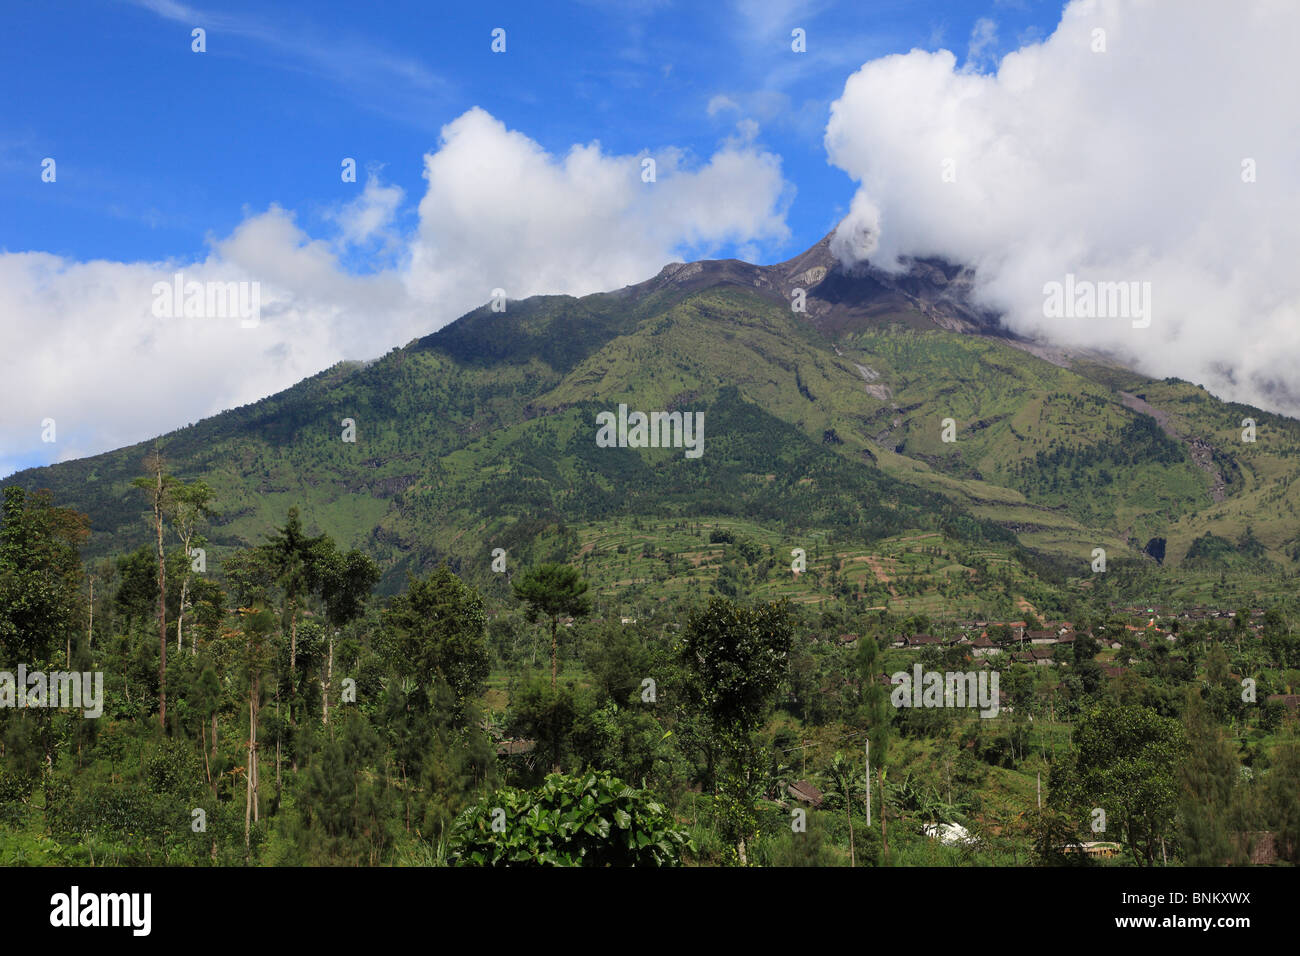 Indonesia, Java, Gunung Merapi volcano; tropical vegetation; - Stock Image